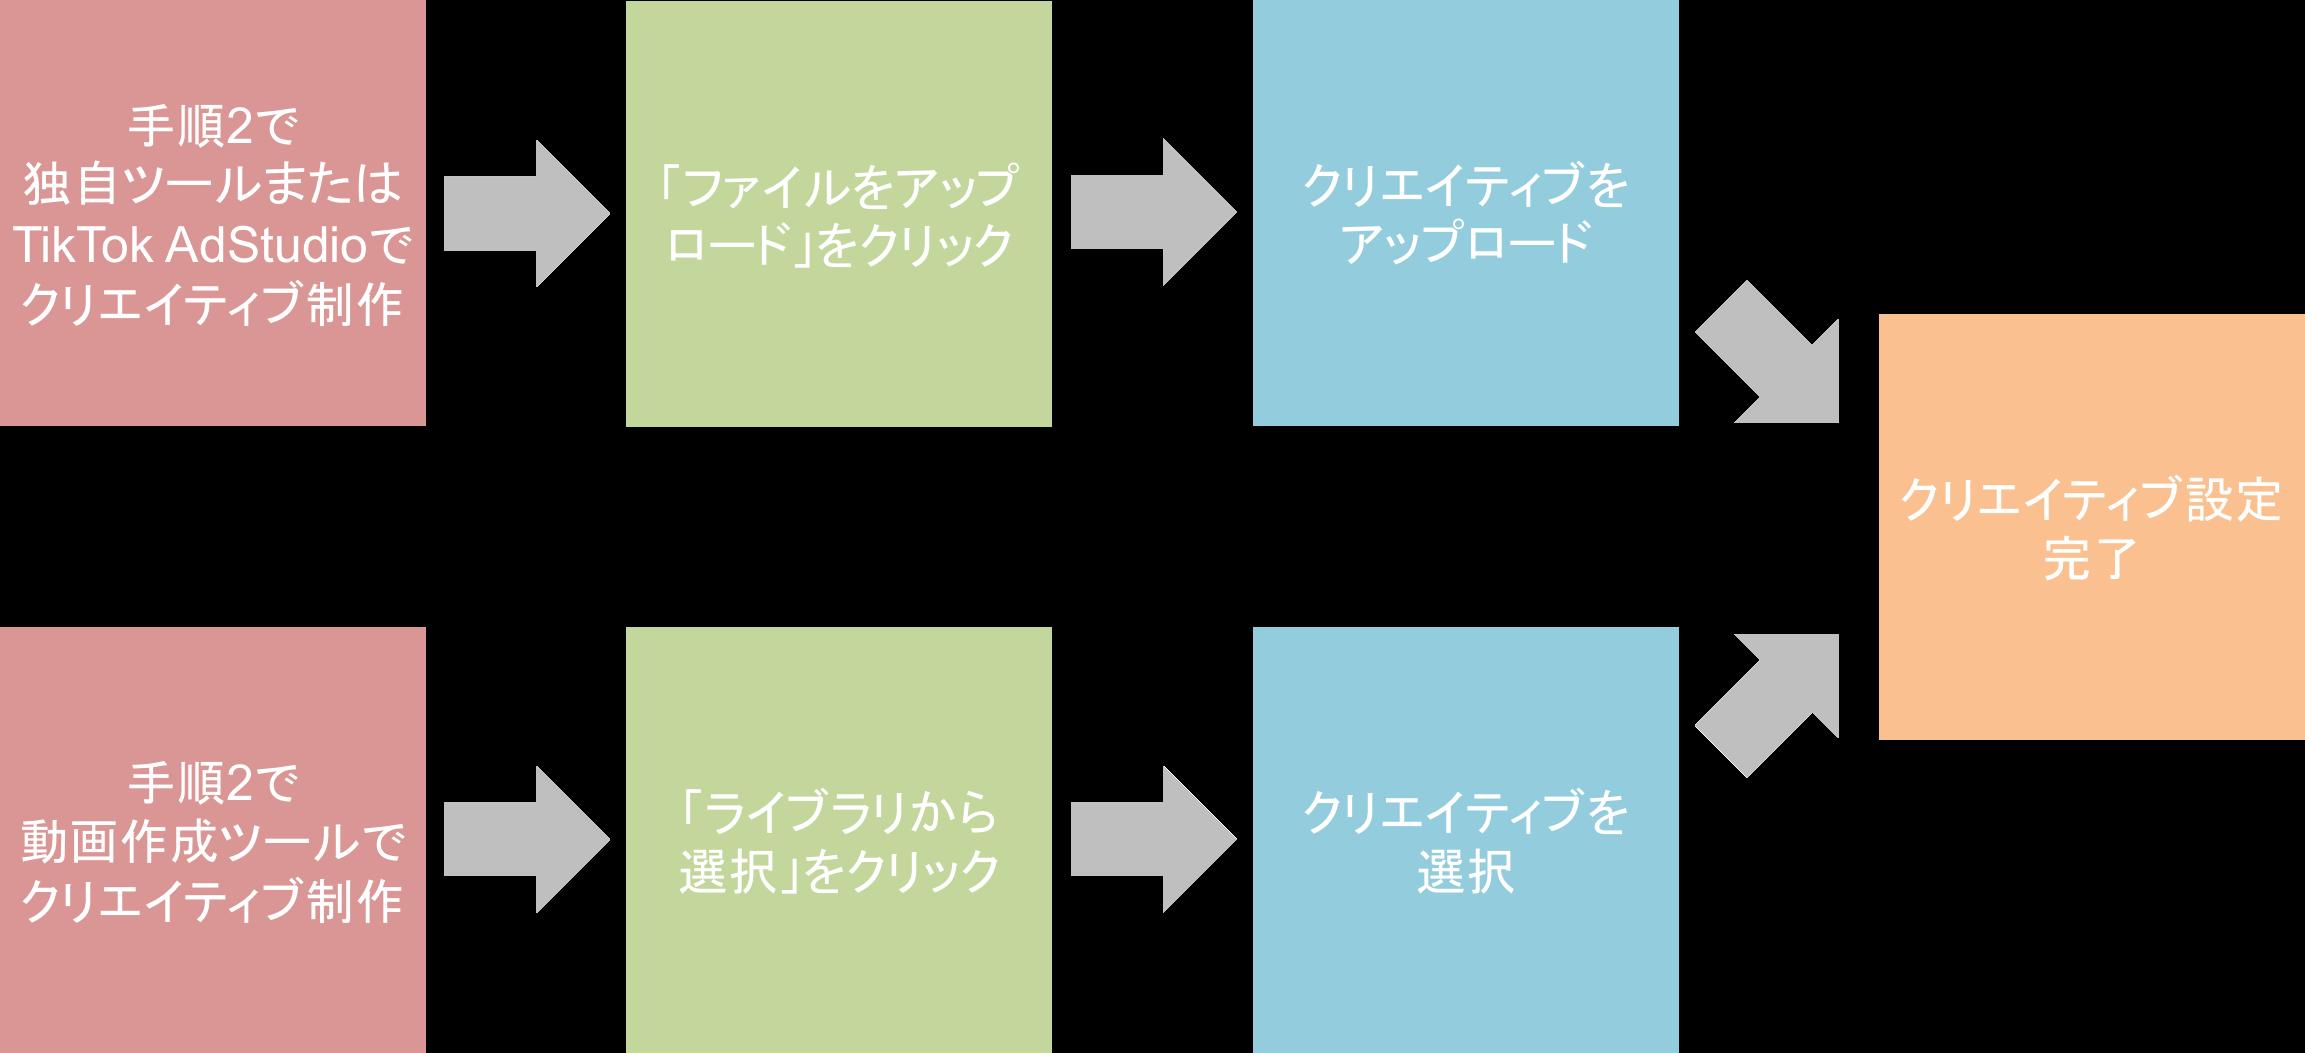 TikTokの運用型広告「TikTok Ads」のクリエイティブ設定の流れ